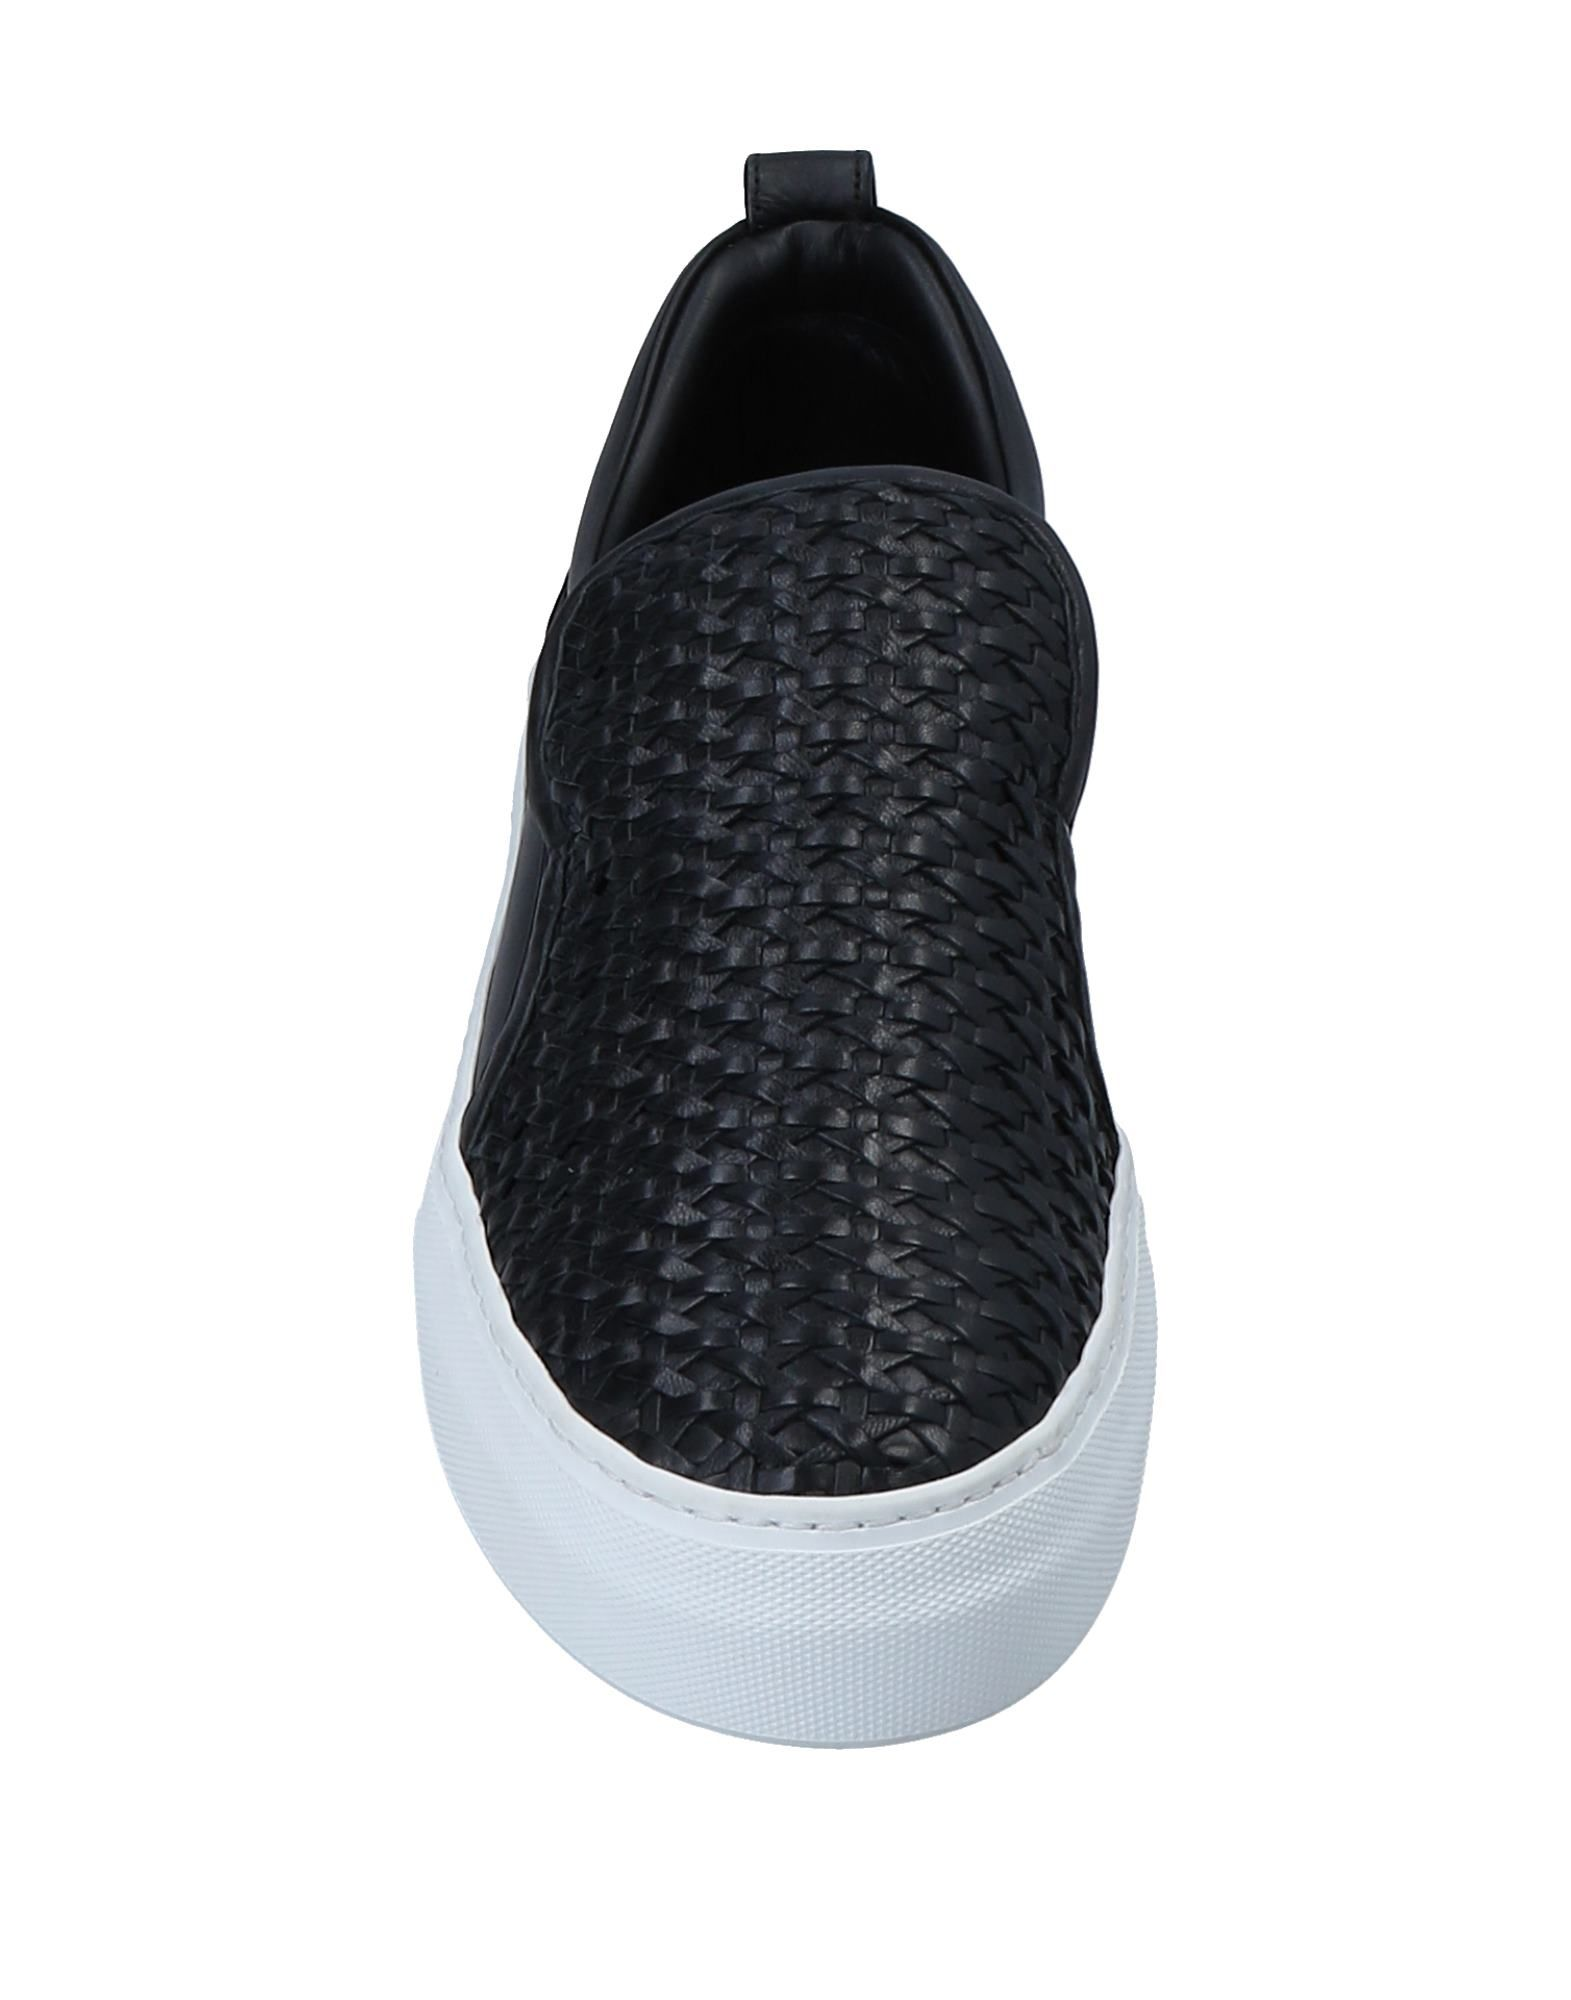 Buscemi Sneakers aussehende Damen  11558451ODGünstige gut aussehende Sneakers Schuhe 5989a9